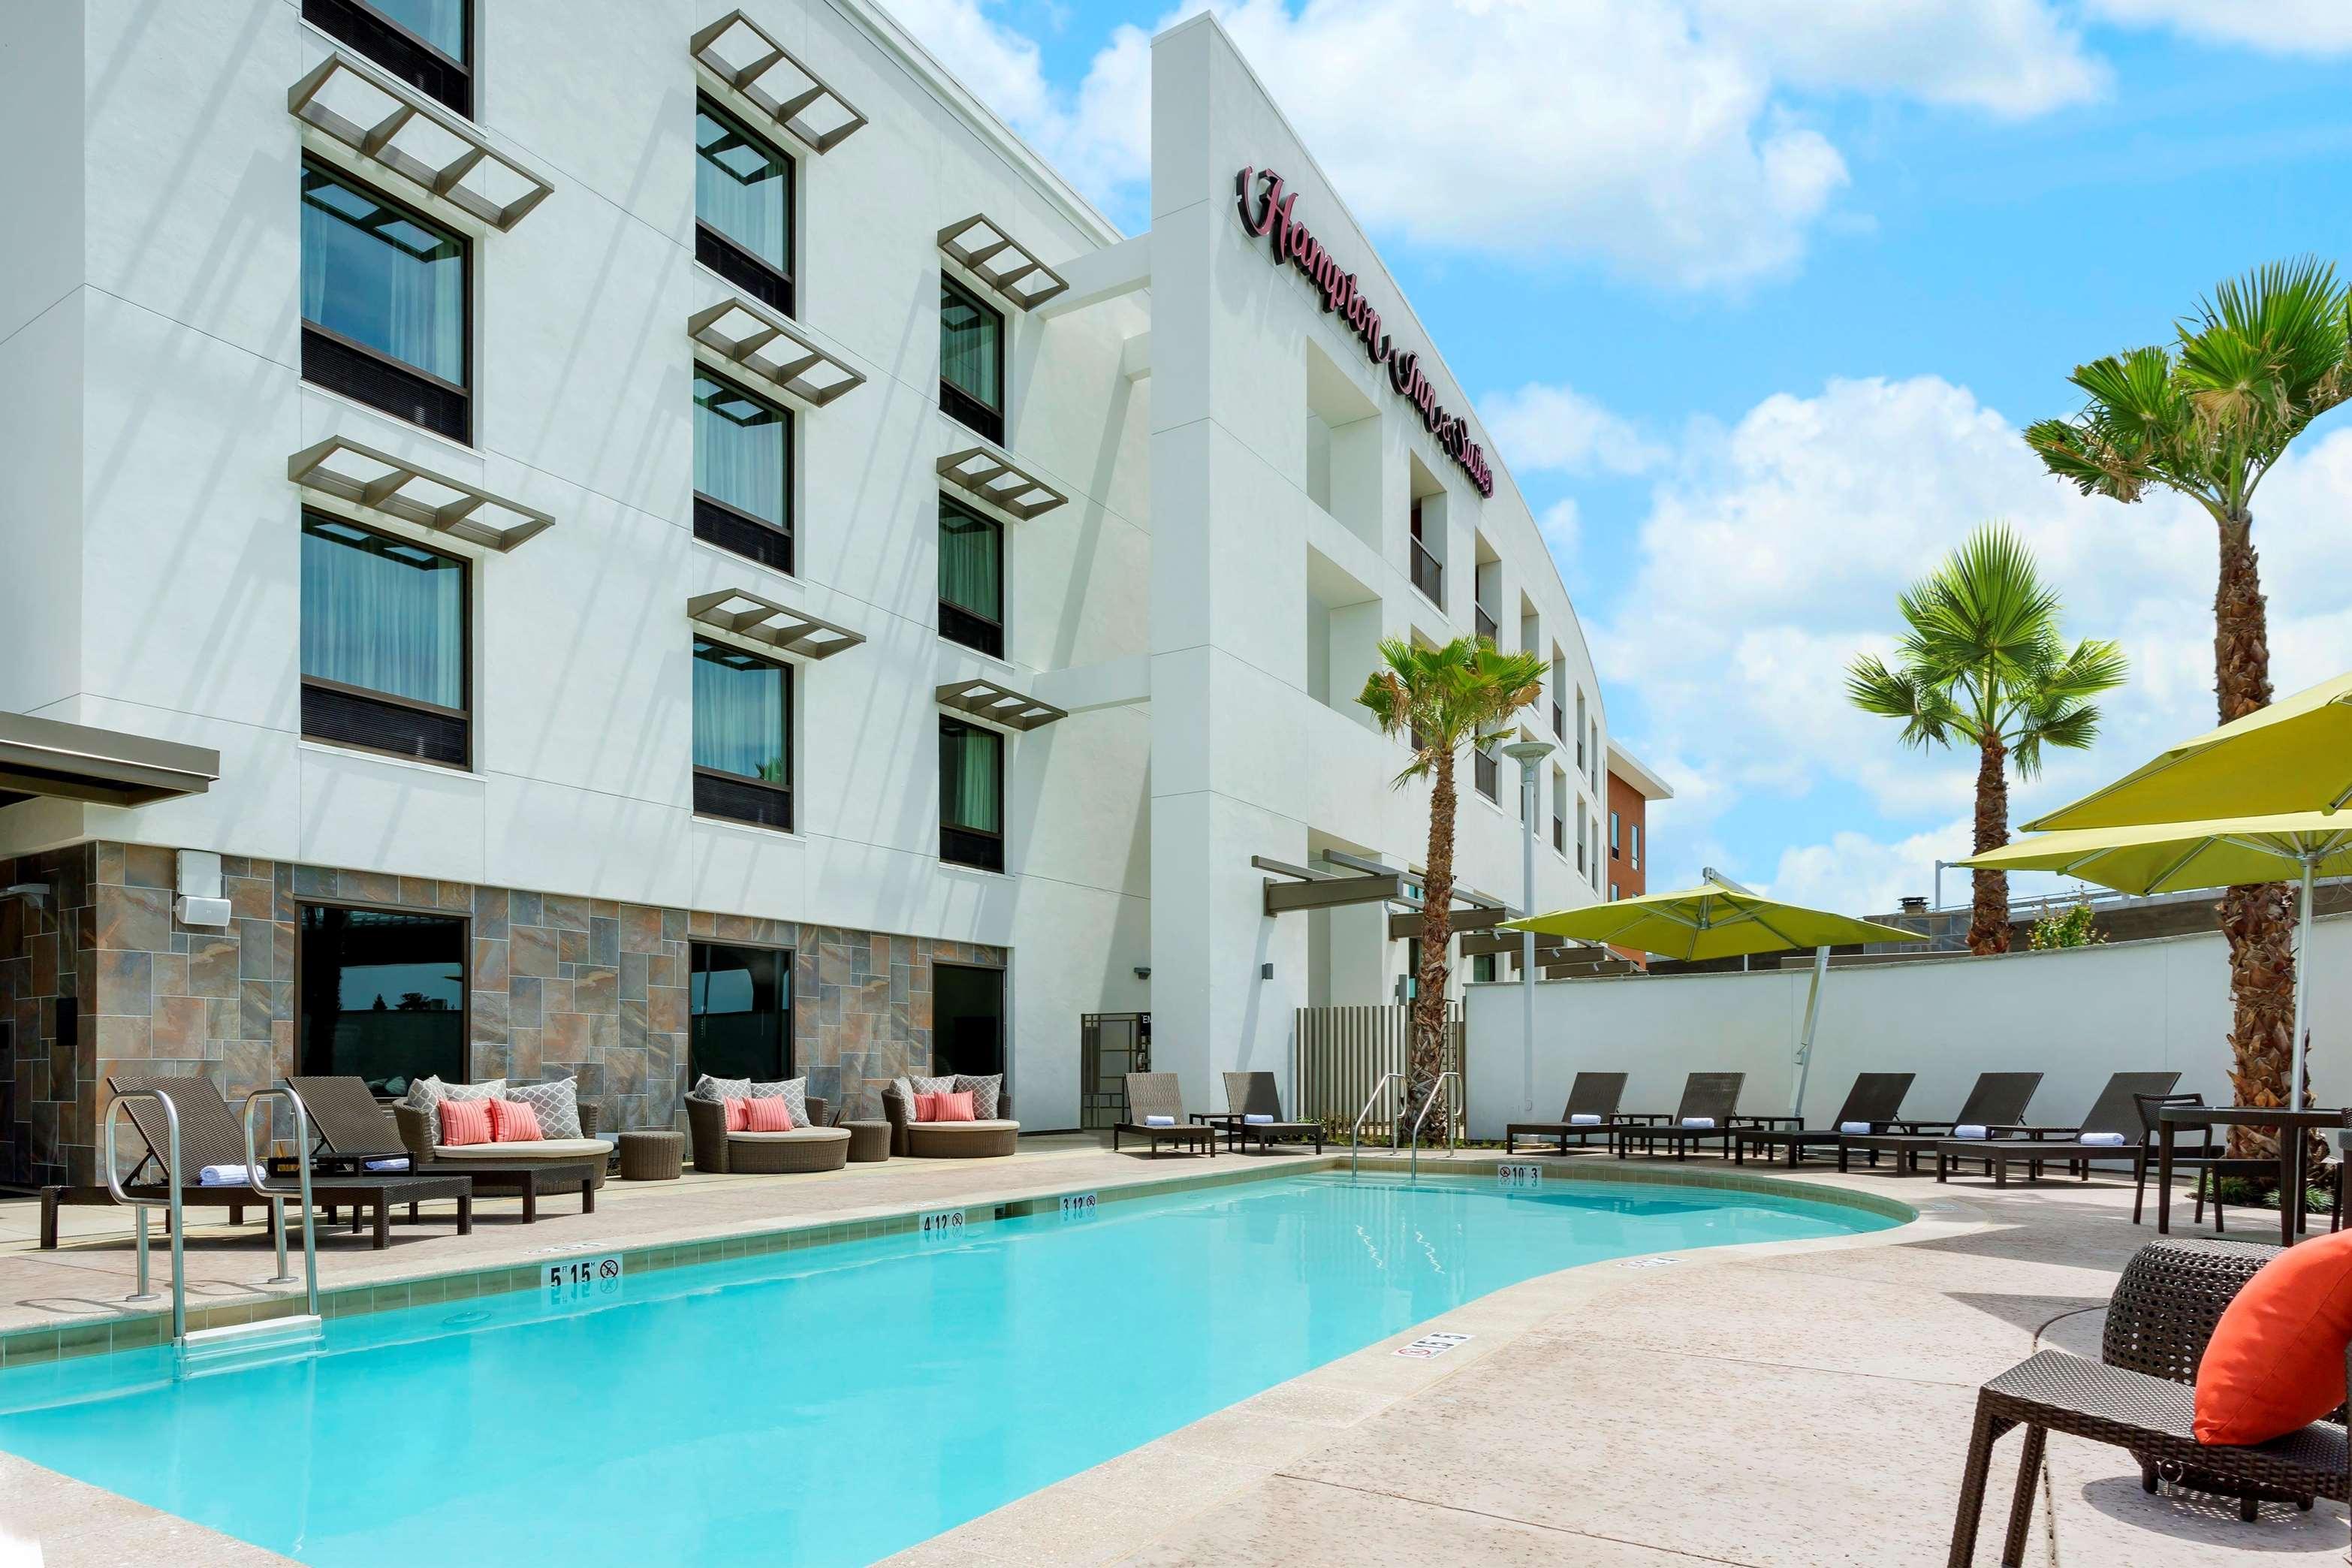 Hampton Inn & Suites Napa image 19